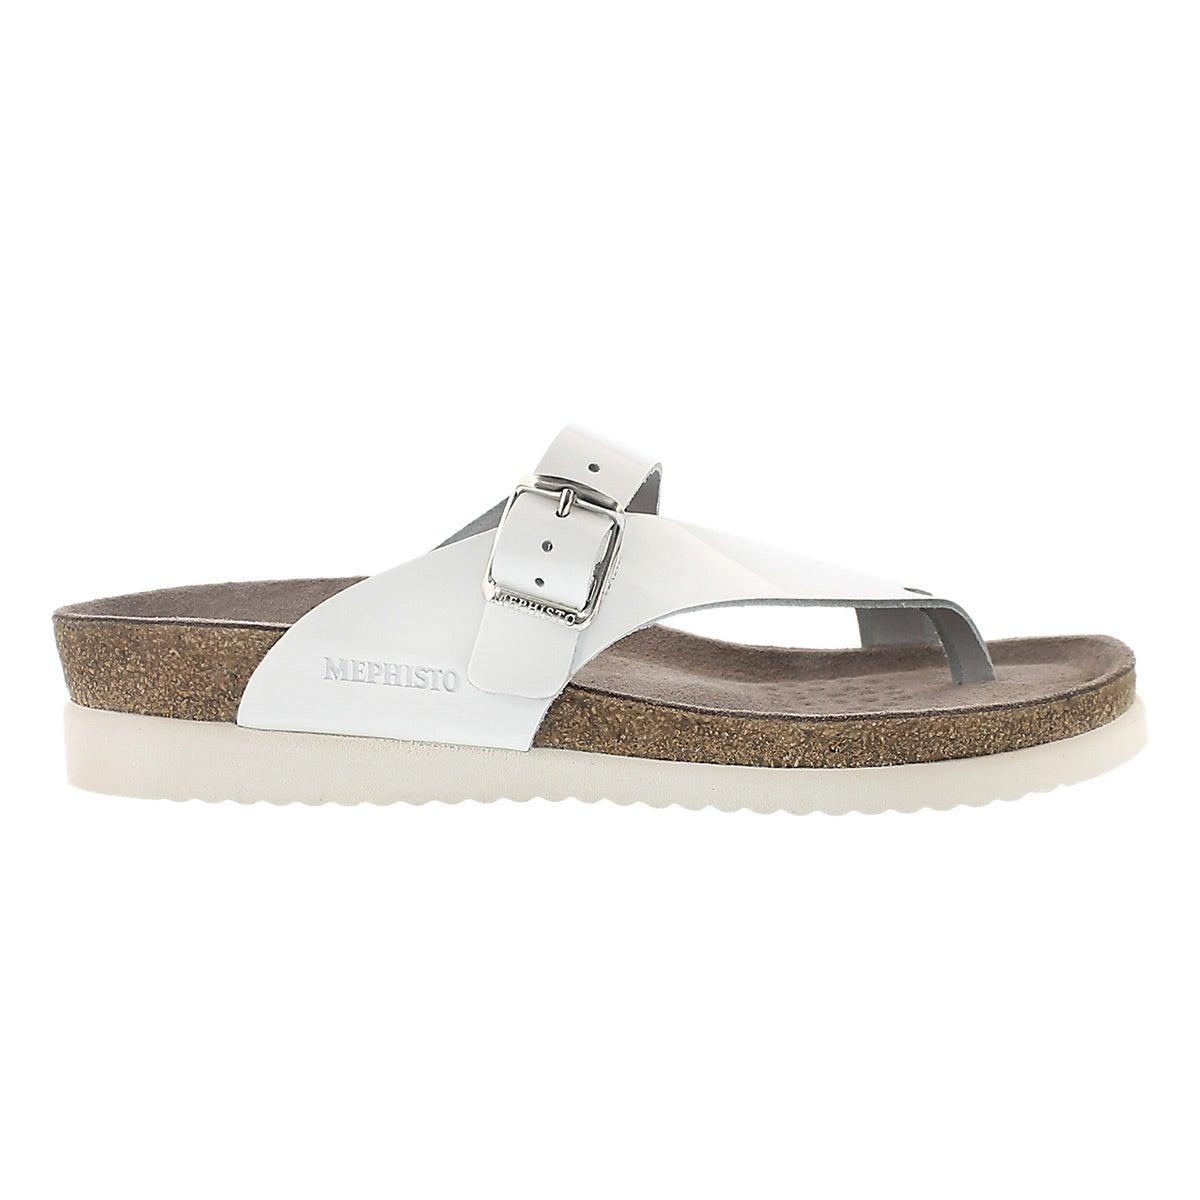 Sandales tongs Helen, blanc verni, fem